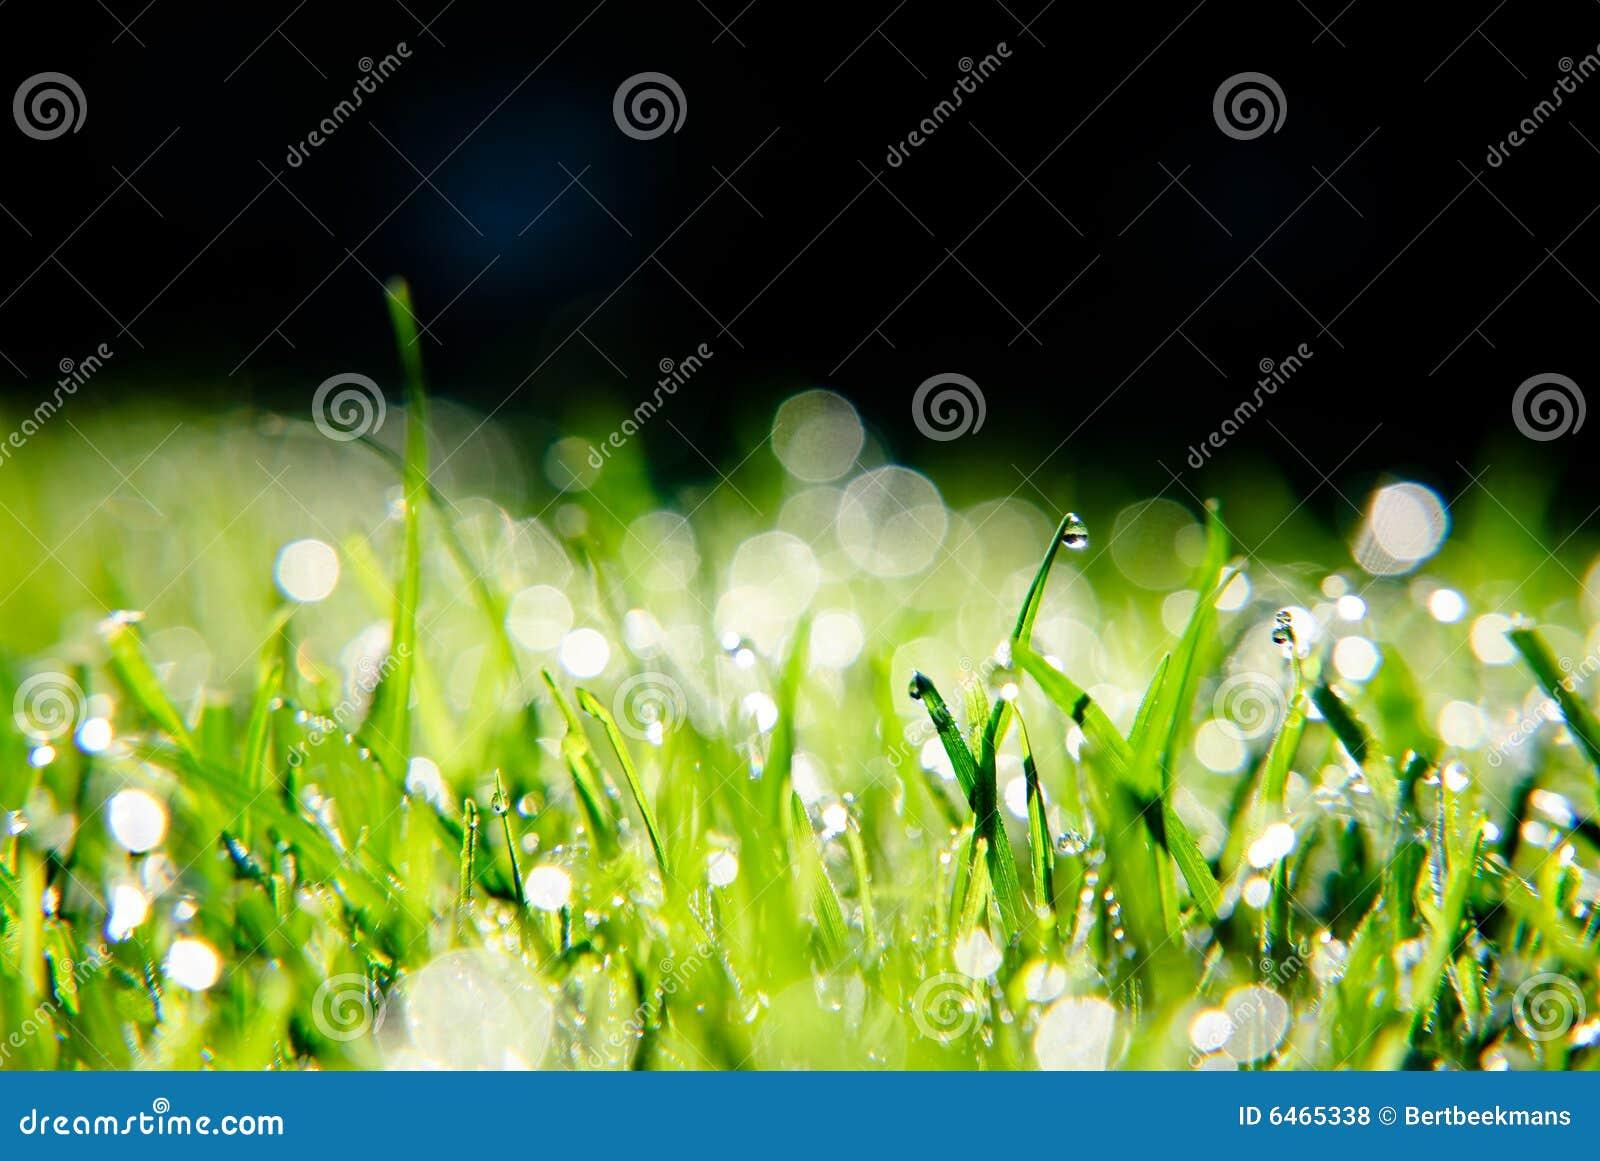 Rosa kropli trawy.